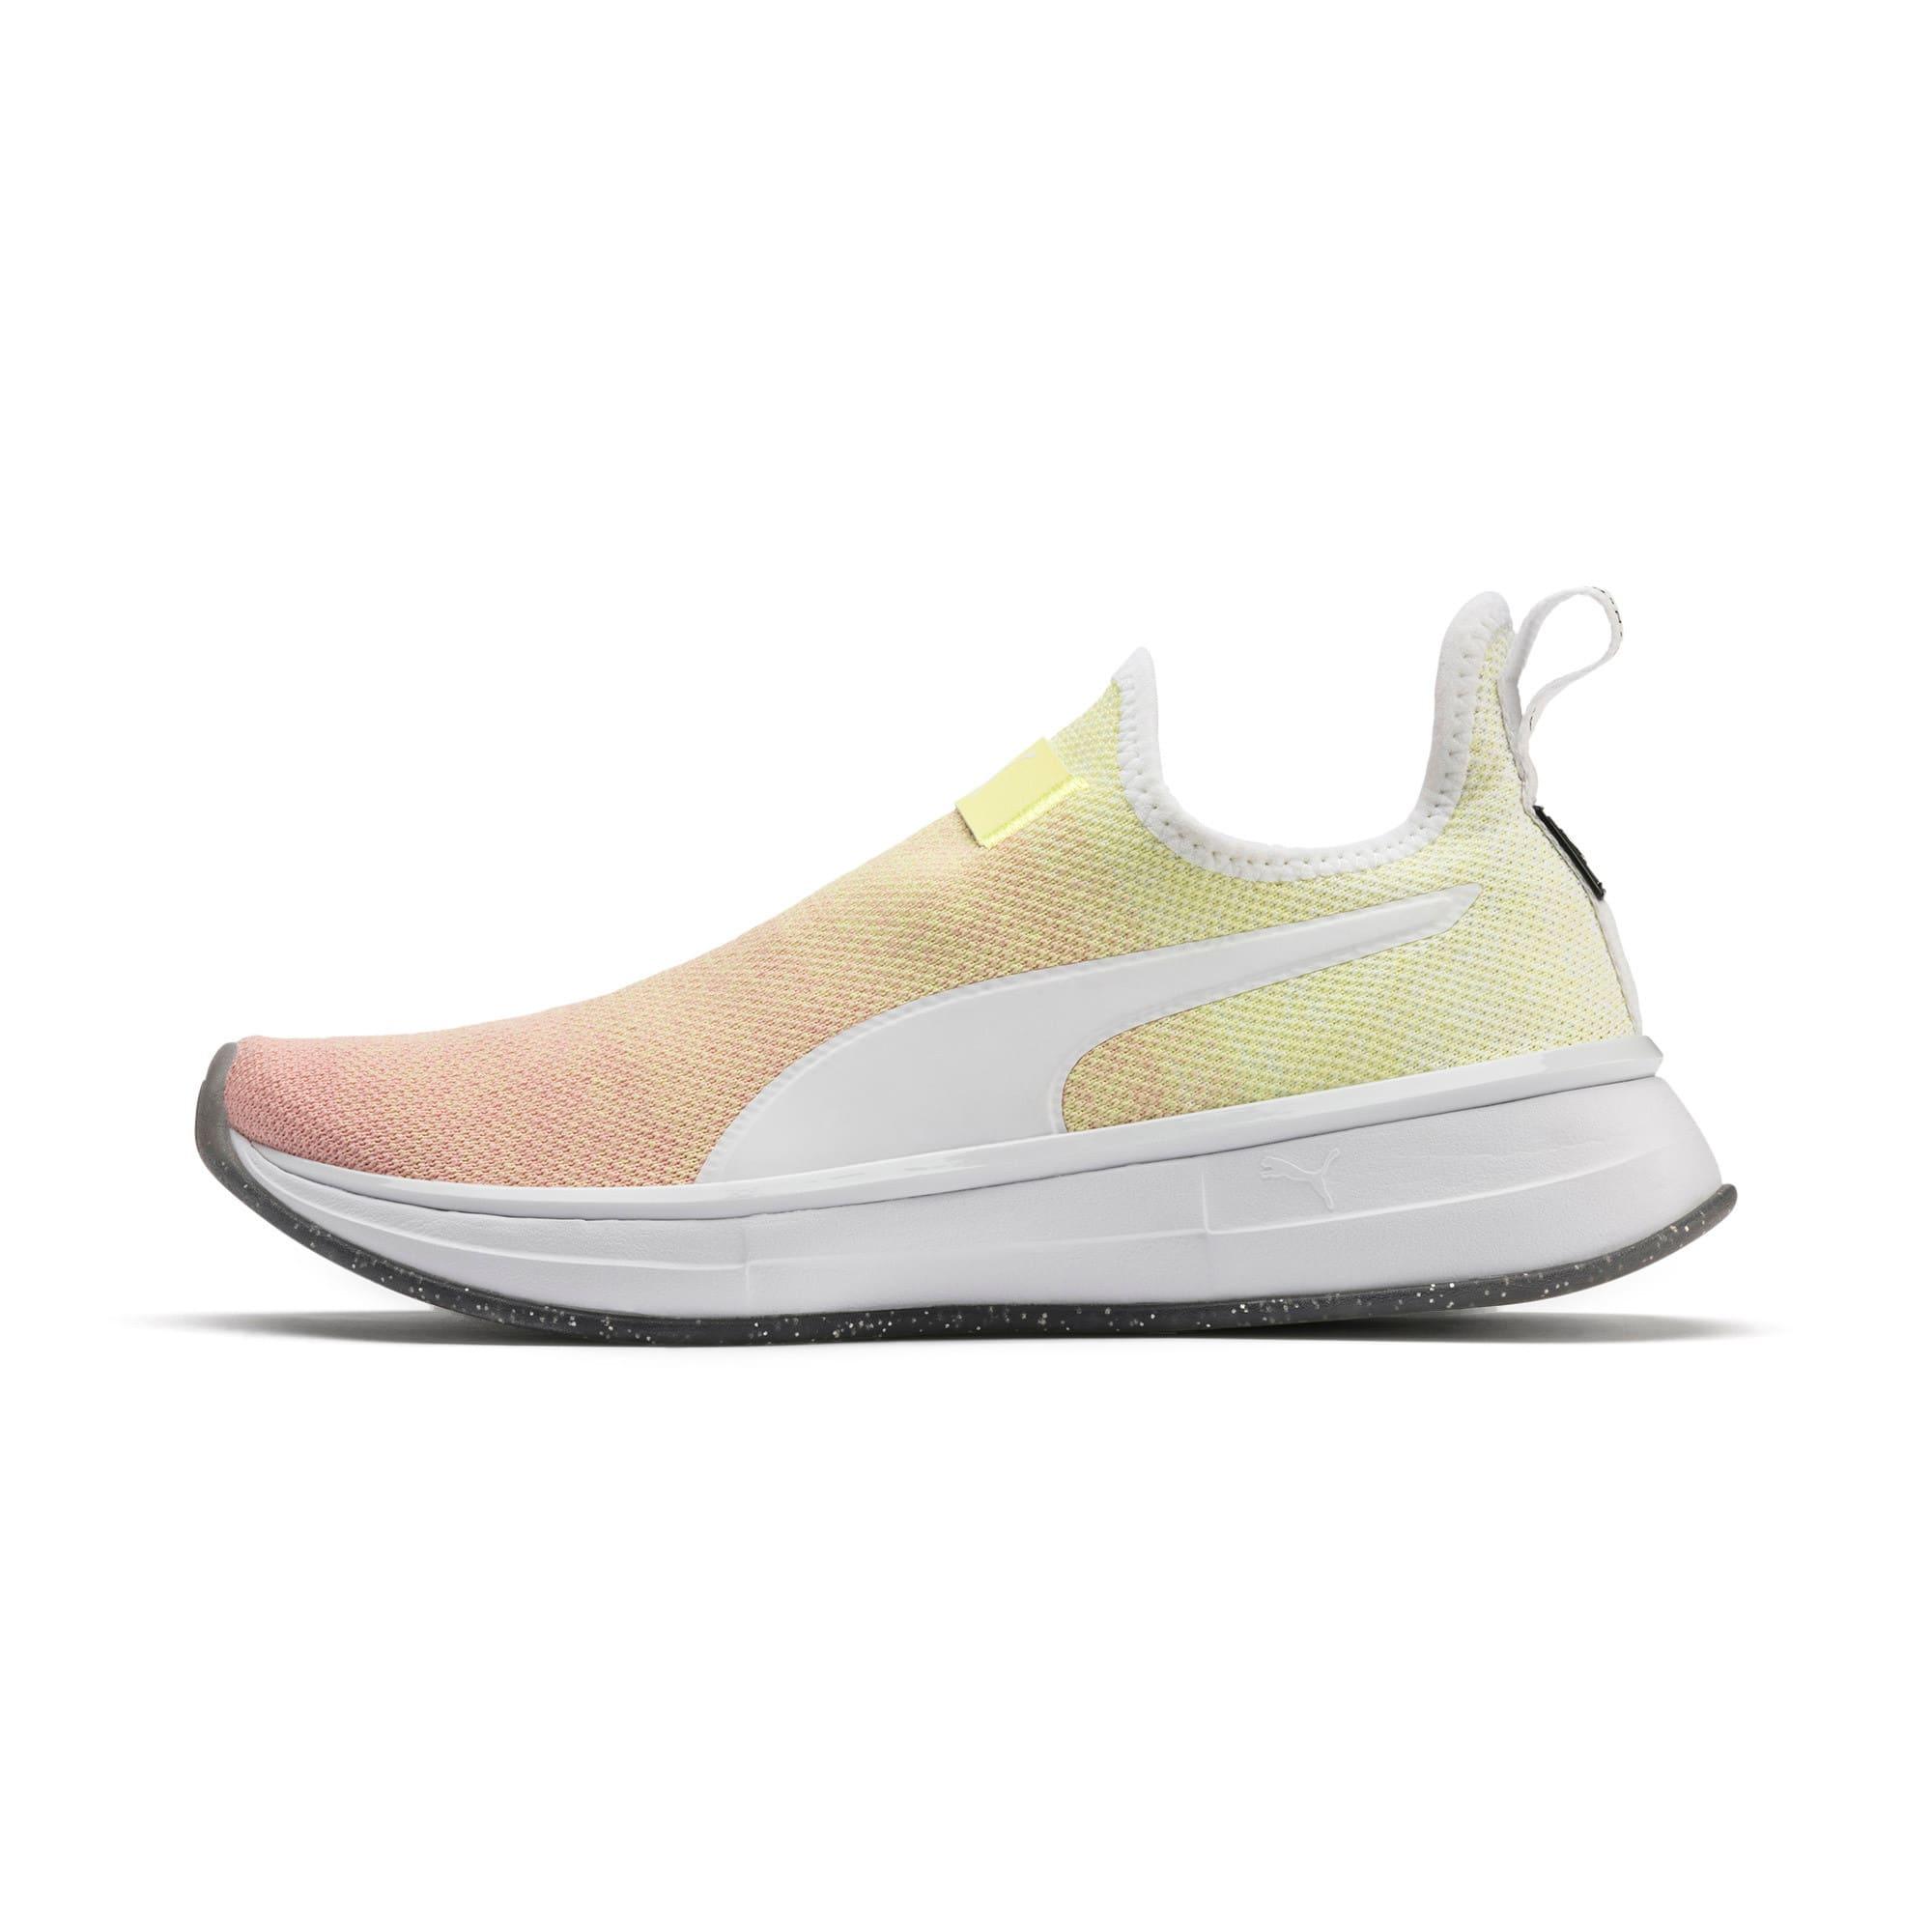 Thumbnail 1 of SG Slip-On Sunrise Women's Training Shoes, YELLOW-Peach Bud-White, medium